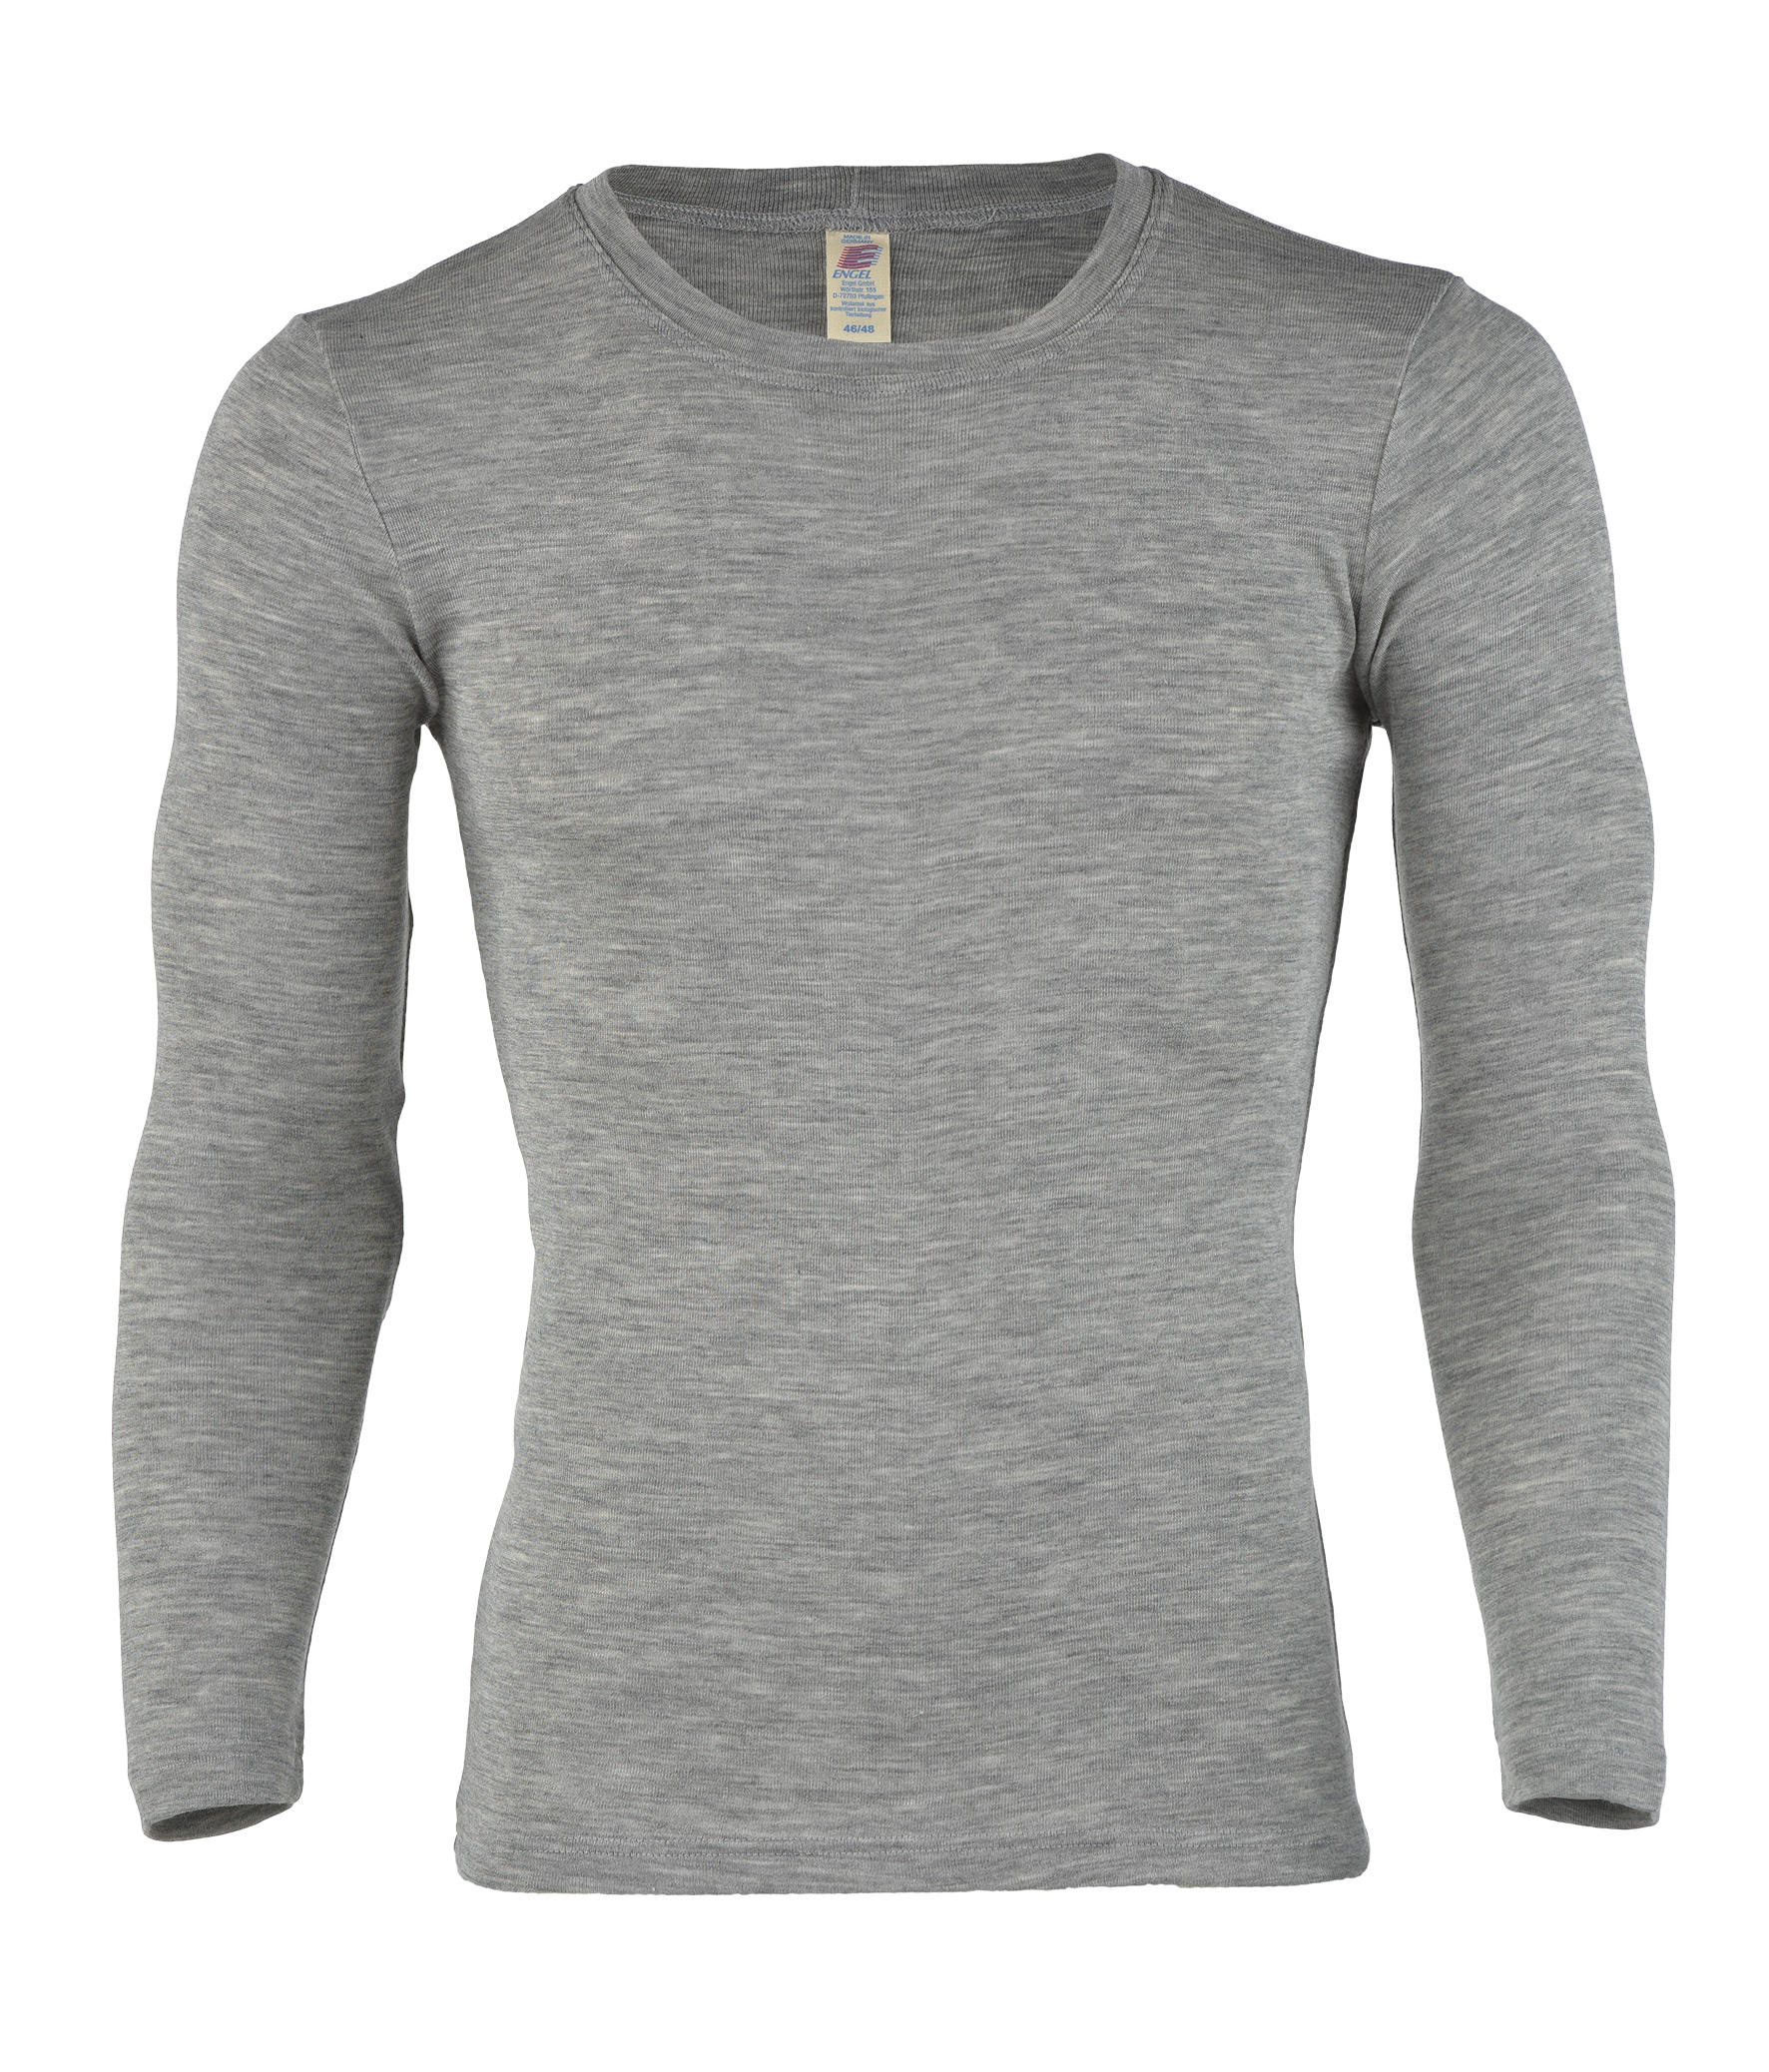 "Engel ""Herren-Shirt langarm"" - grau"